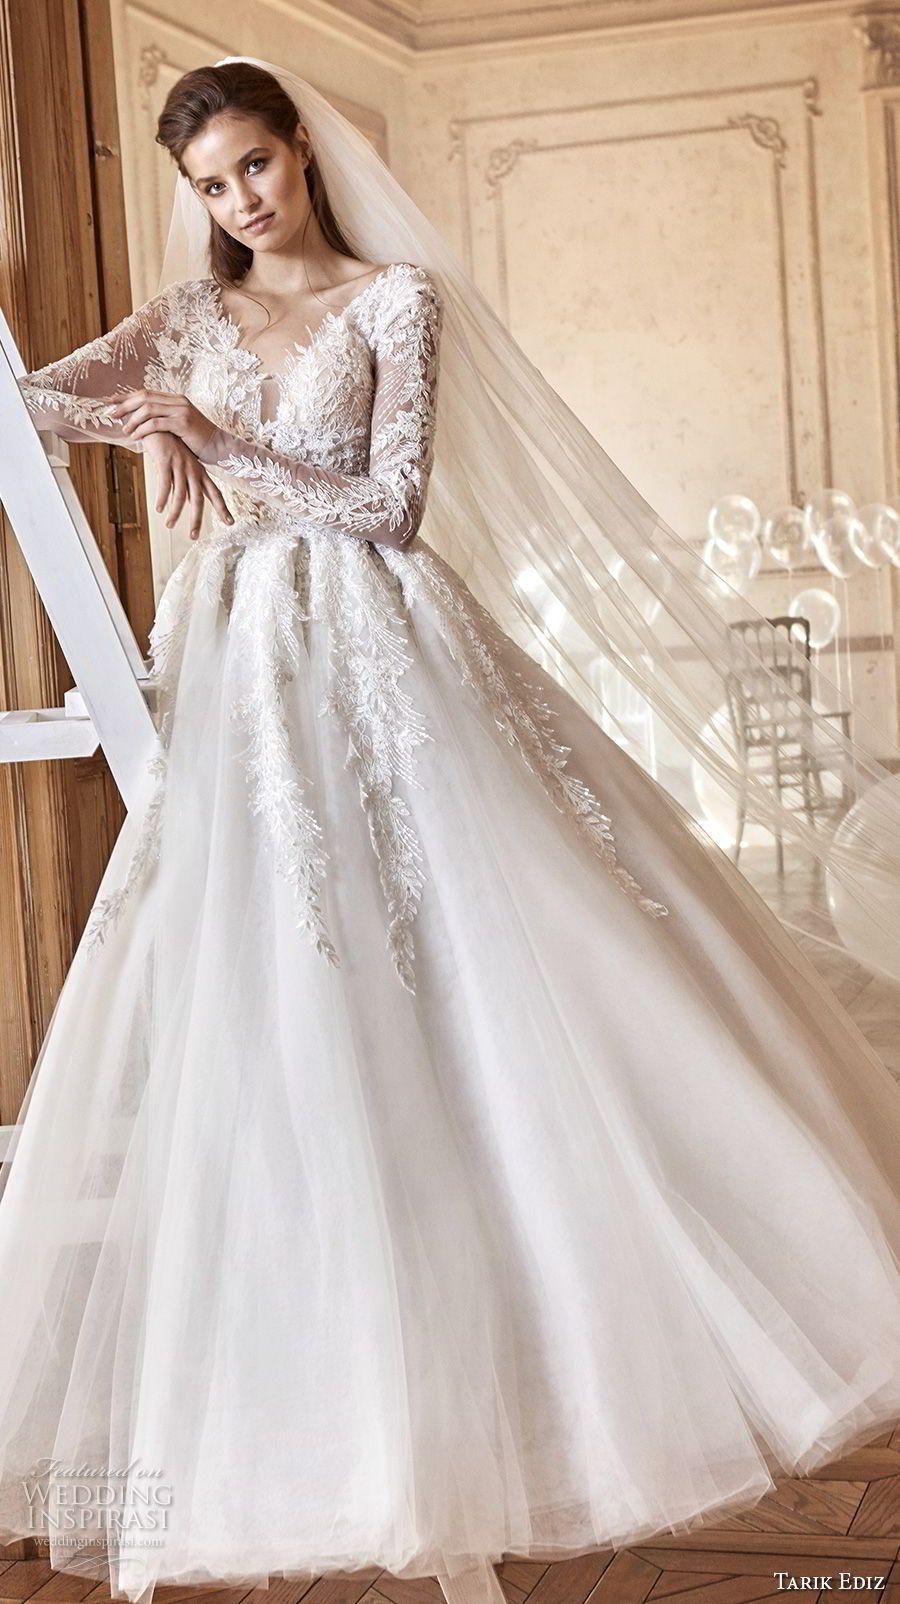 Tarik Ediz 2017 Bridal Long Sleeves V Neck Heavily Embellished Bodice A Line Wedding Dress 24 Mv White Dresses